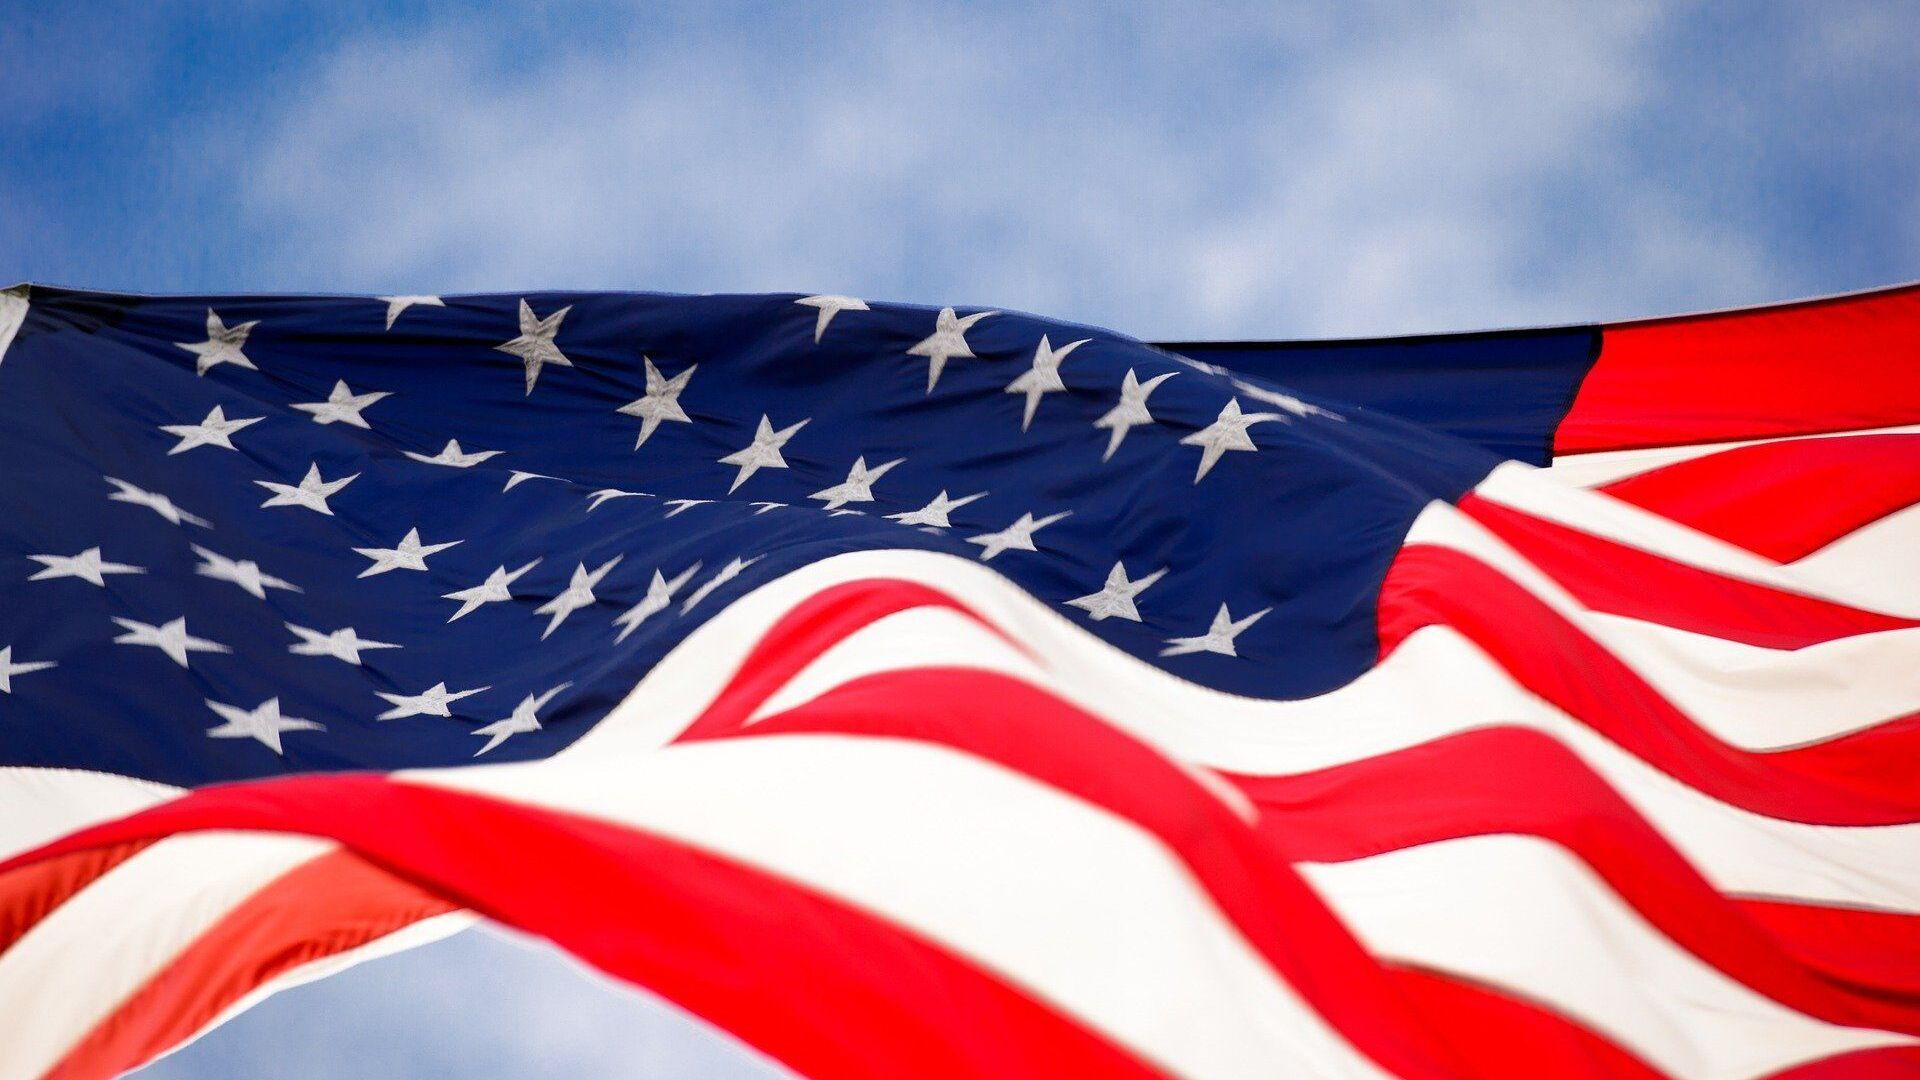 Bandera de EEUU - Sputnik Mundo, 1920, 07.04.2021